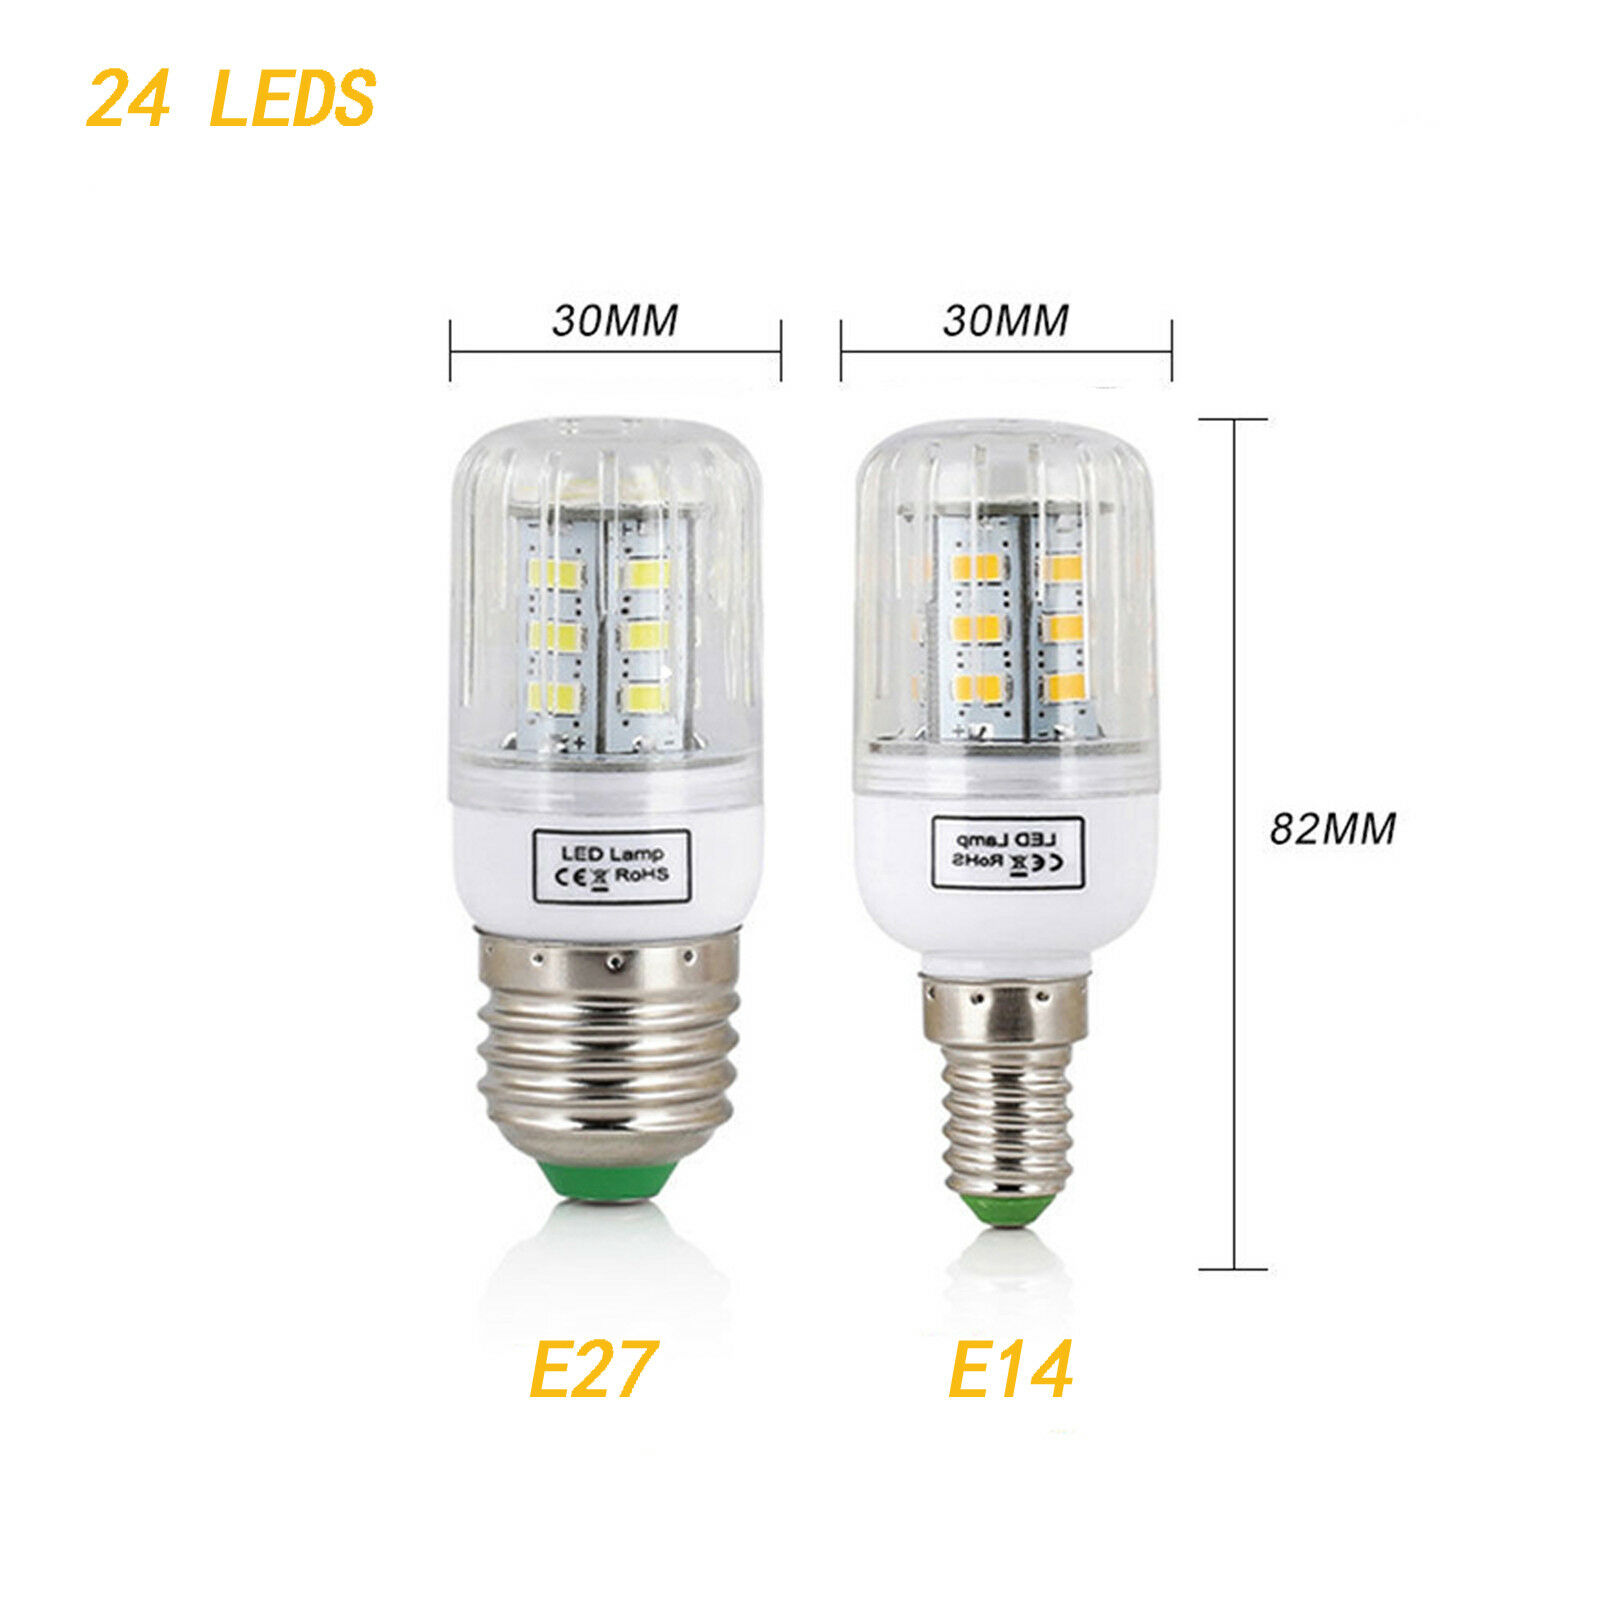 E27 E14 7W 9W 12W 15W 20W 25W 5730 SMD LED Corn Bulb Lamp Light Bright 110/220V 8